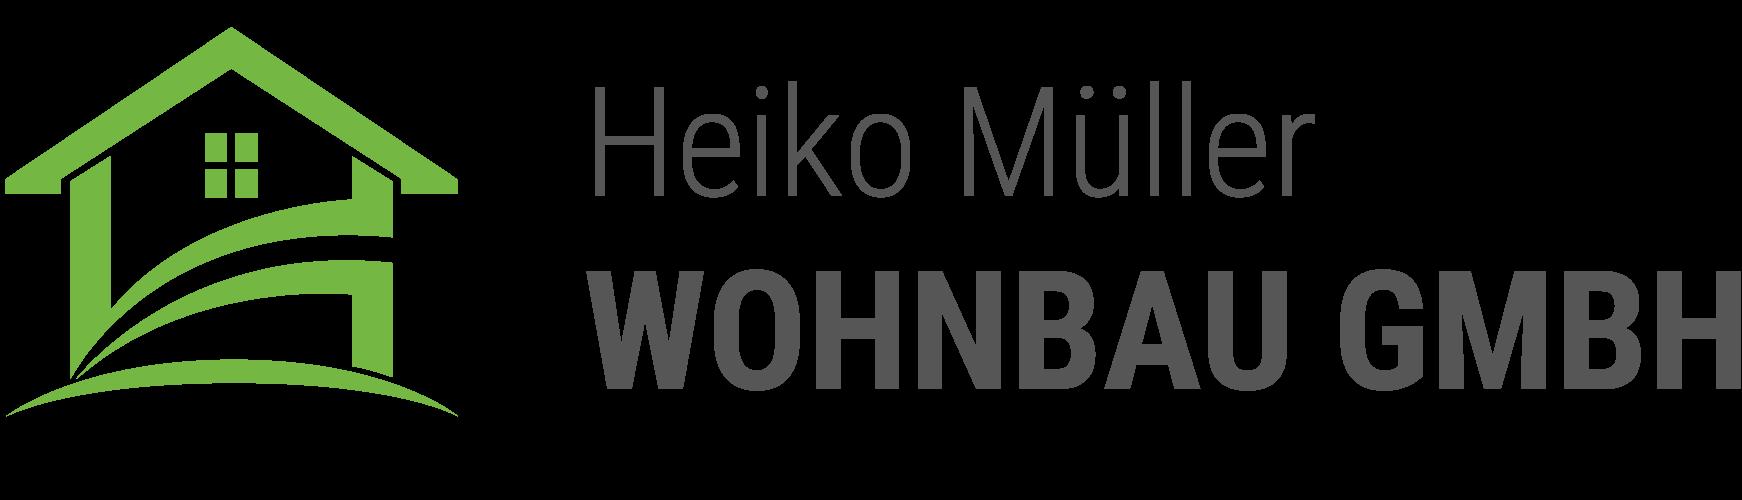 Heiko Müller Wohnbau GmbH